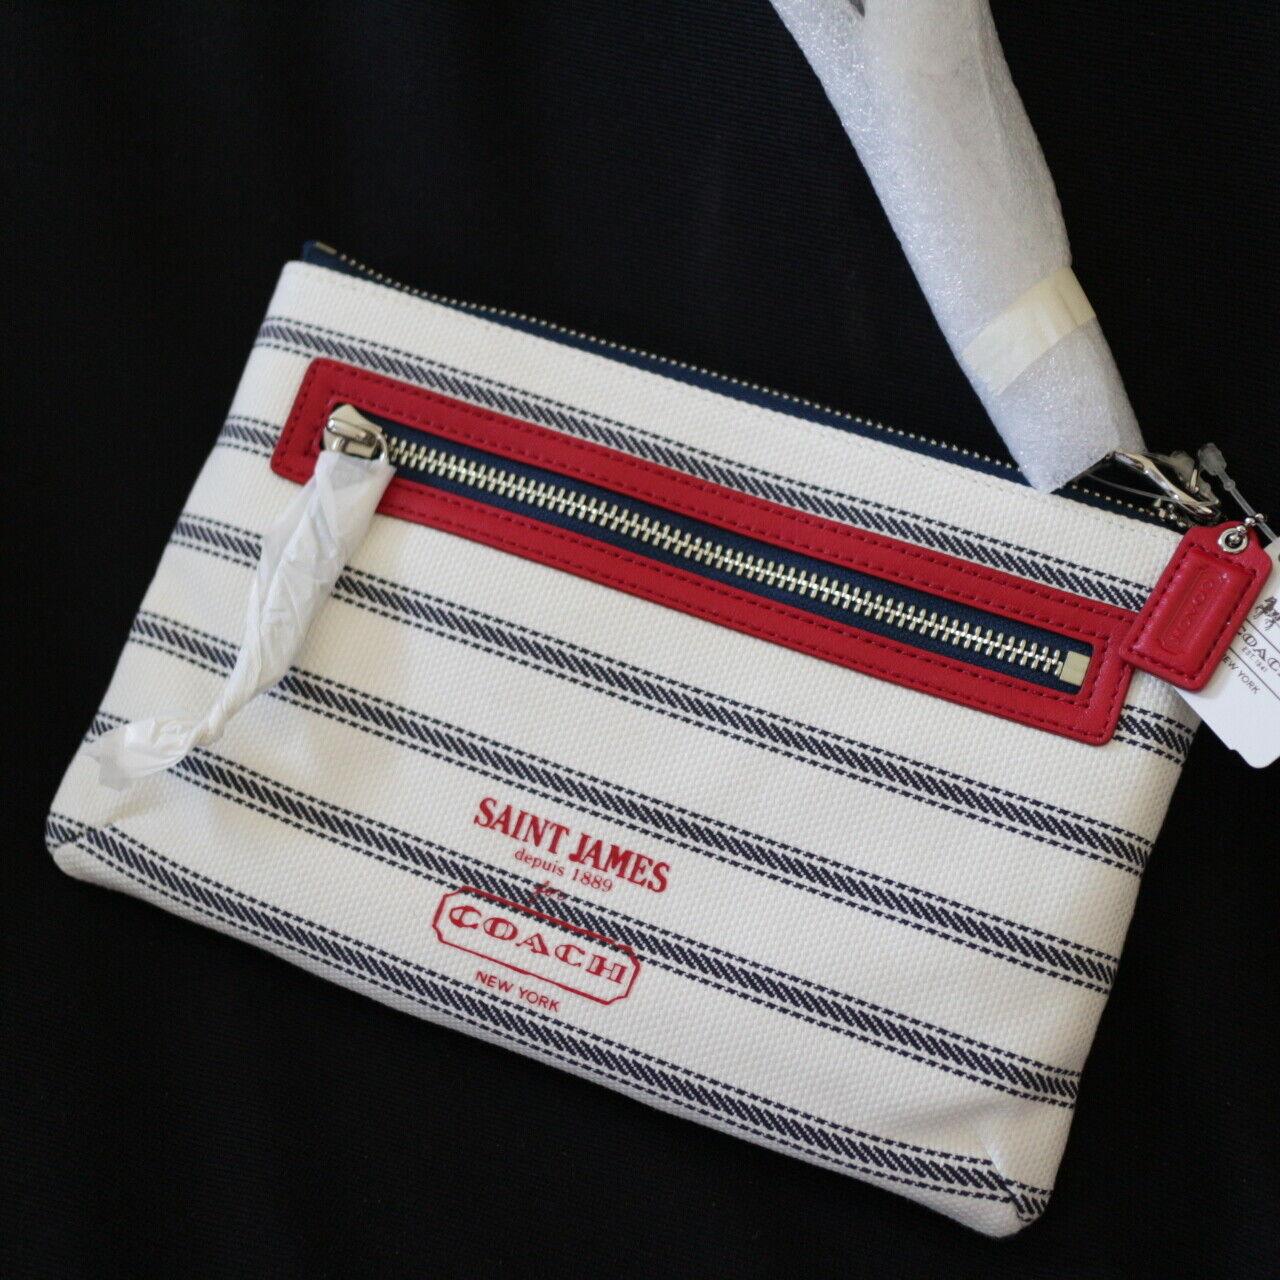 NWT COACH SAINT JAMES Collection Nautical Stripe Wristlet Clutch Wallet NEW